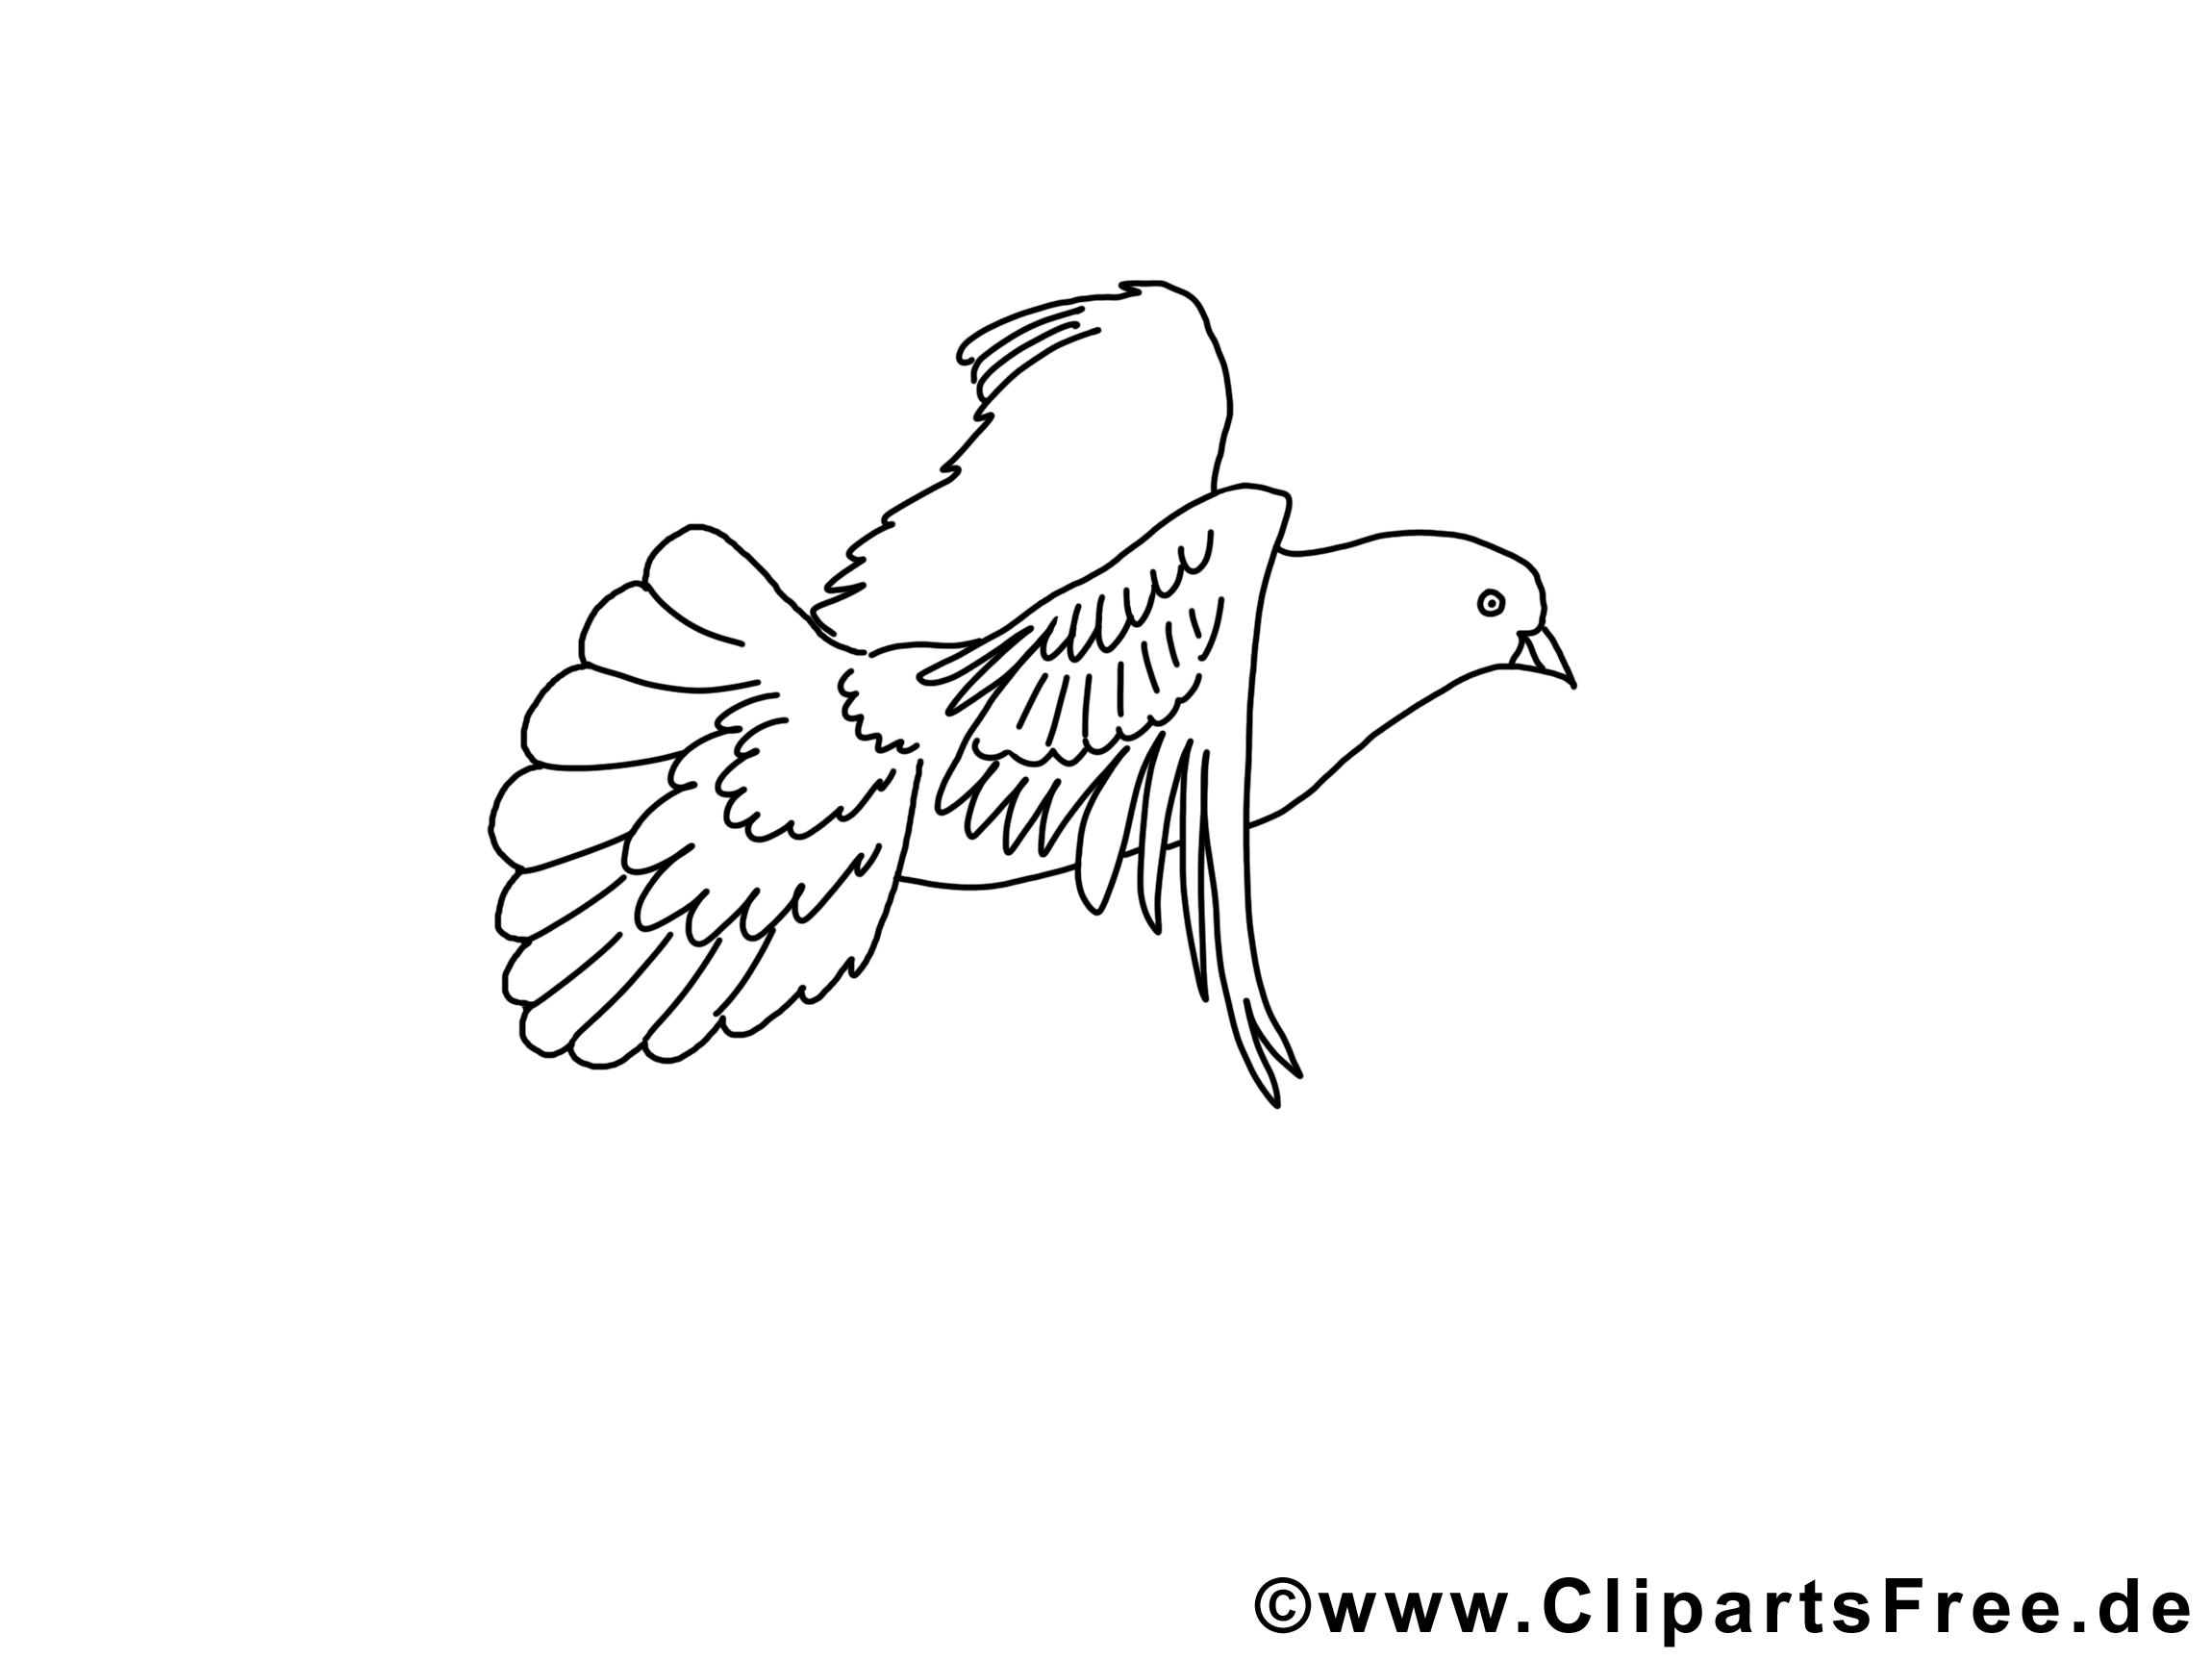 Dessin colombe pentec te gratuits imprimer pentec te - Colombe coloriage ...